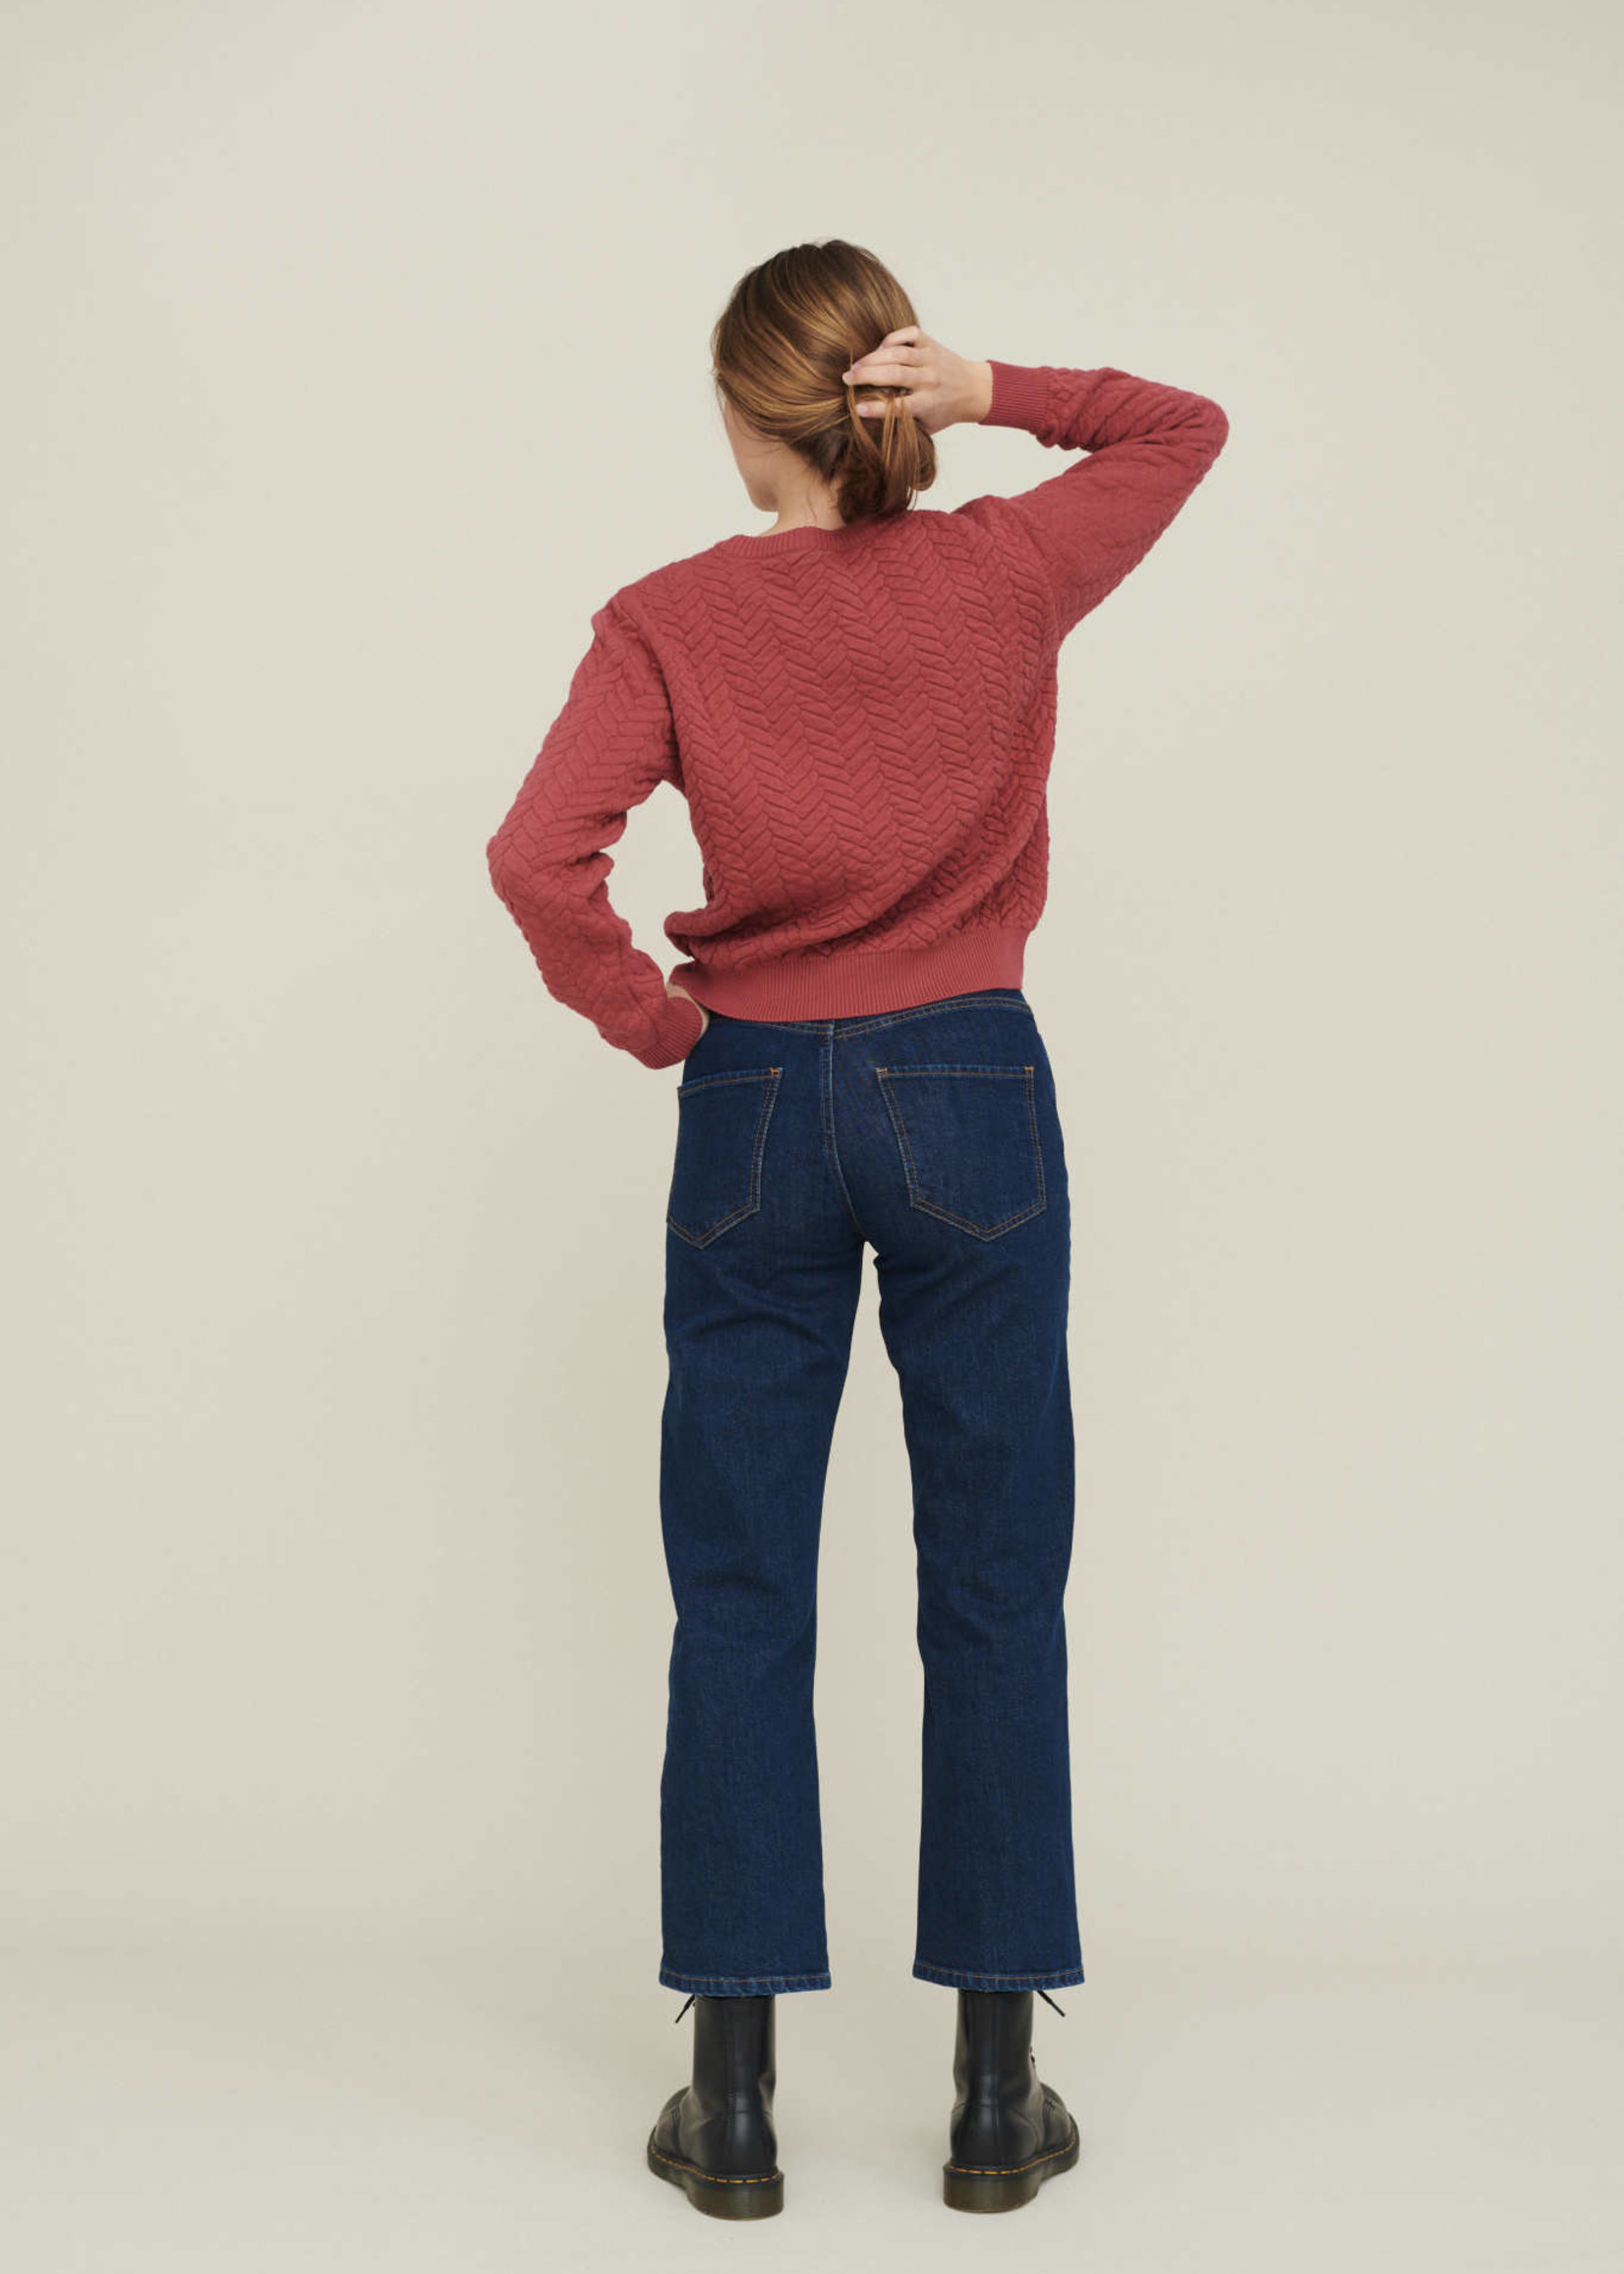 Basic Apparel Tilde Sweater